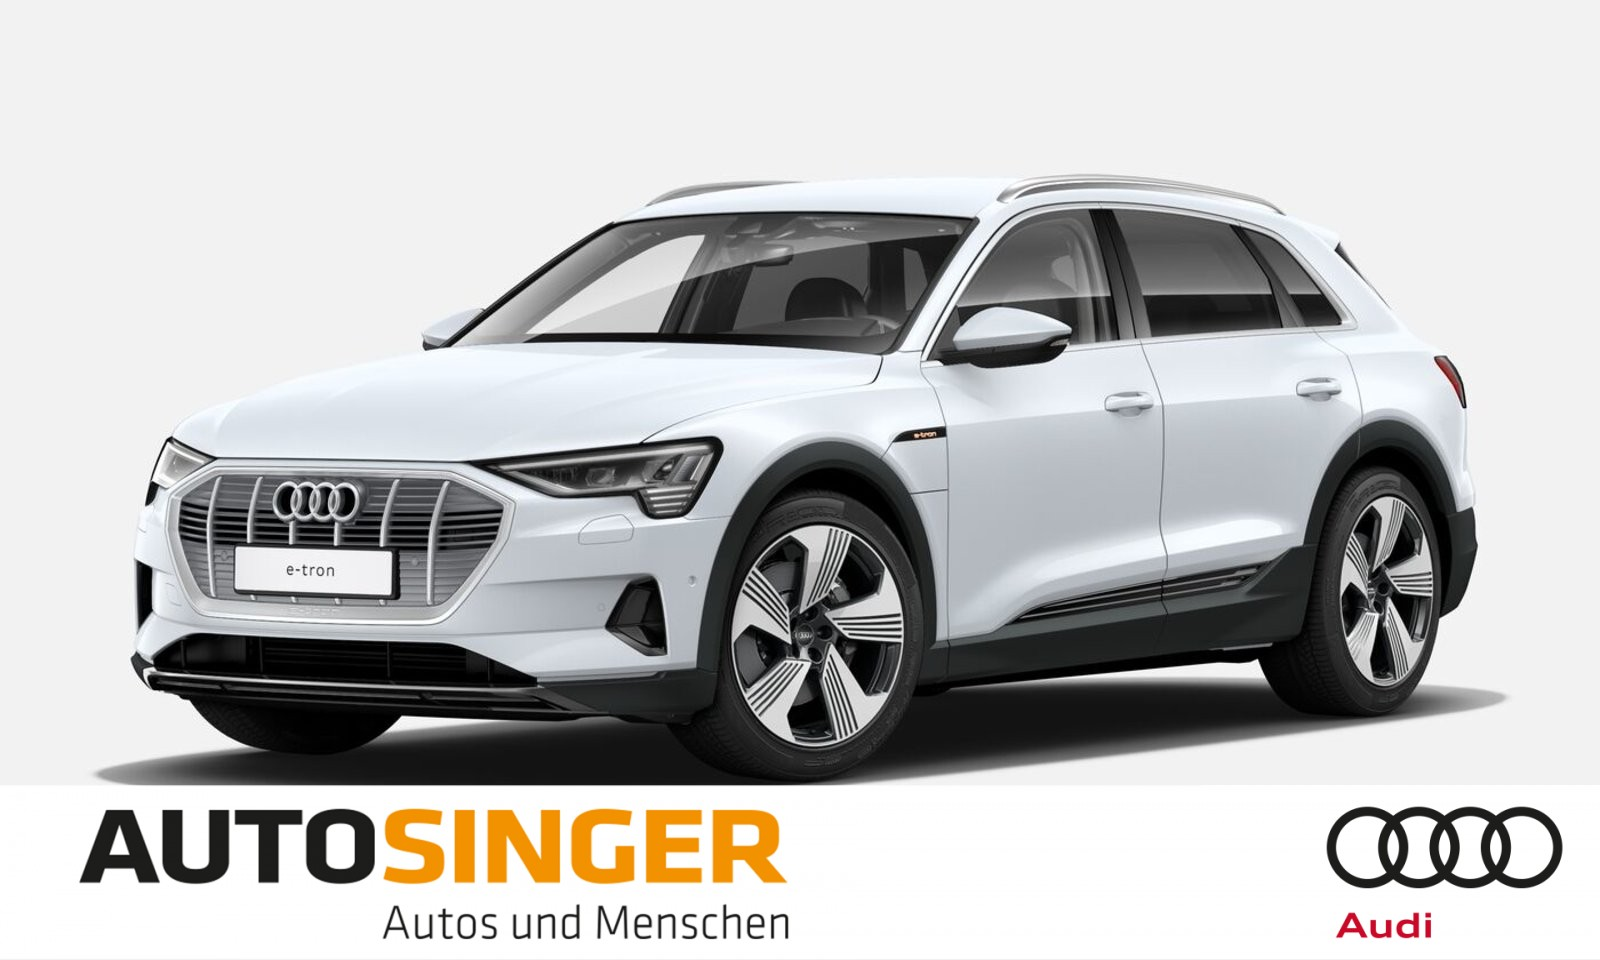 Audi e-tron 50 quattro CAM*VIRTUAL*SHZ*DAB*, Jahr 2020, Elektro